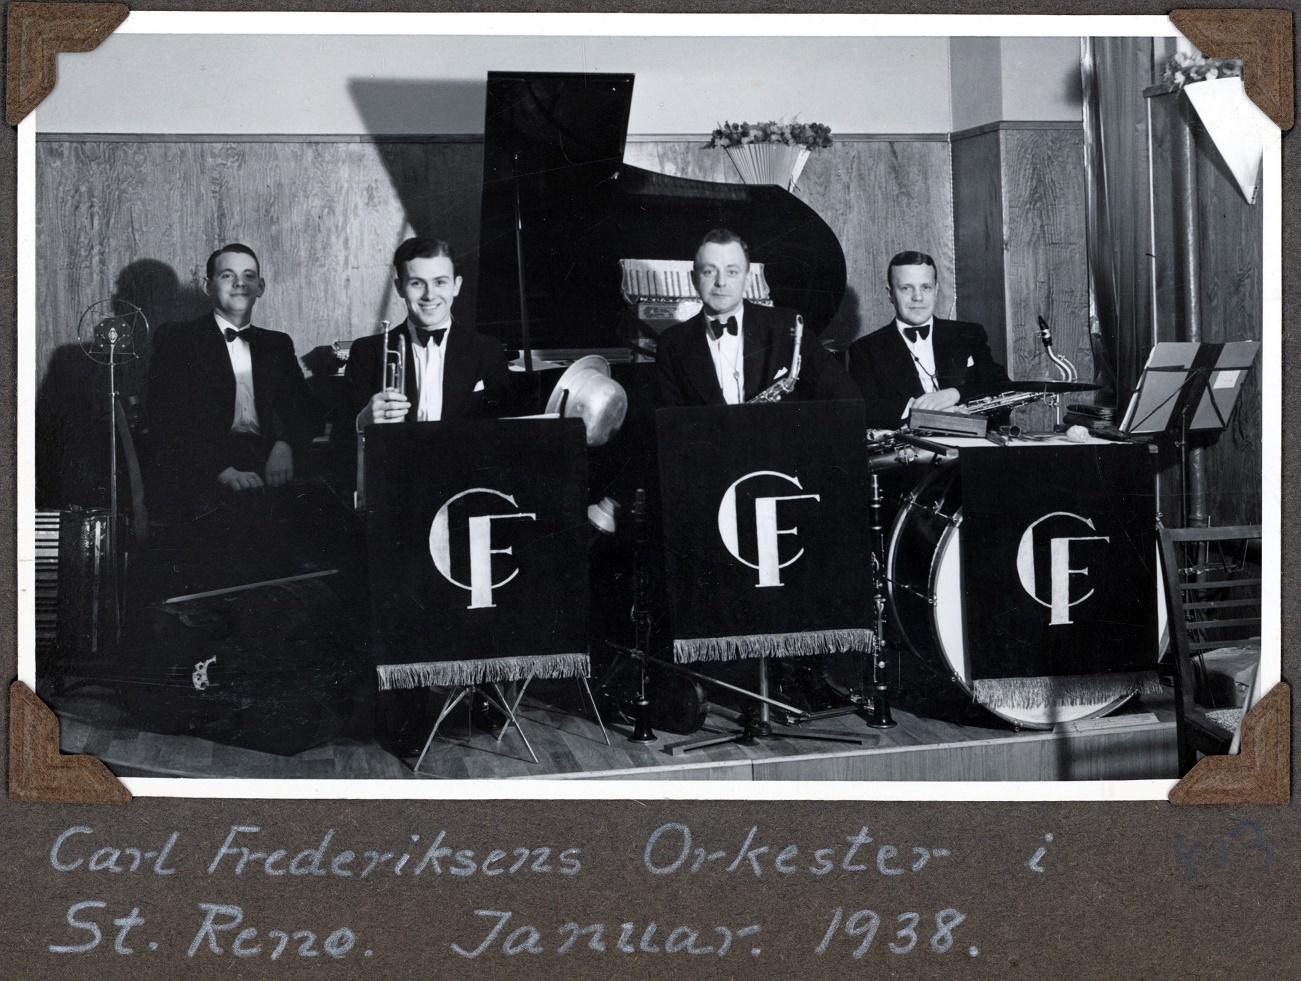 70.403 Carl Frederiksens orkester i St. Reno